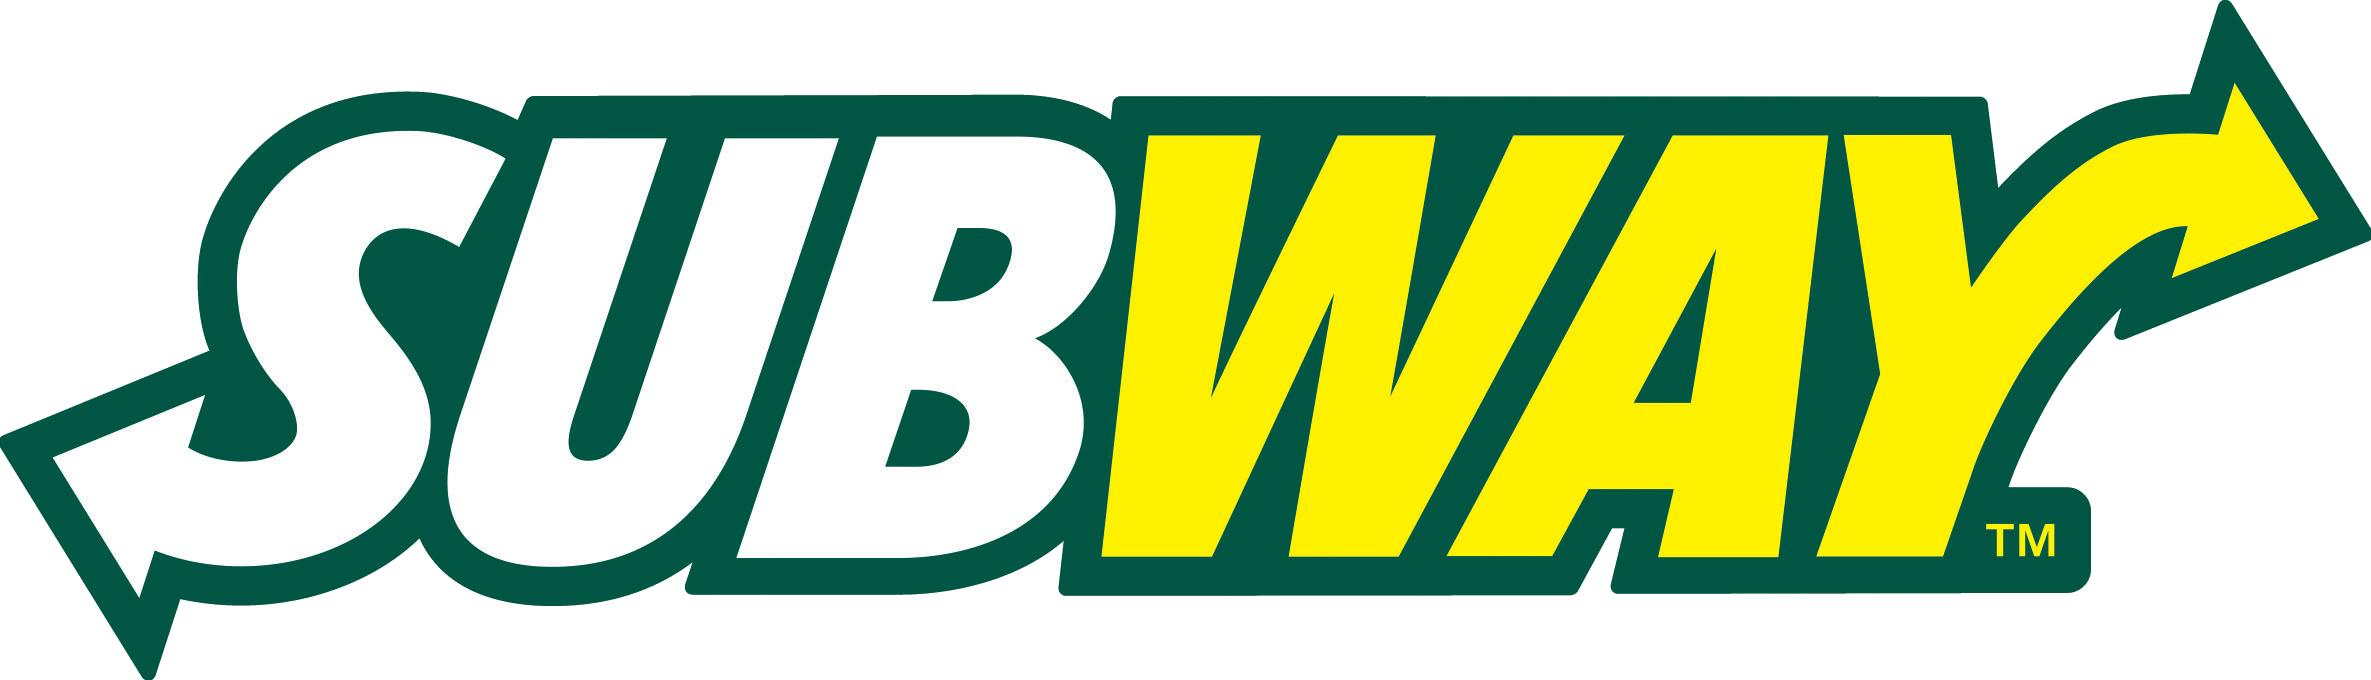 subway logo HD Wallpapers Download Free subway logo Tumblr